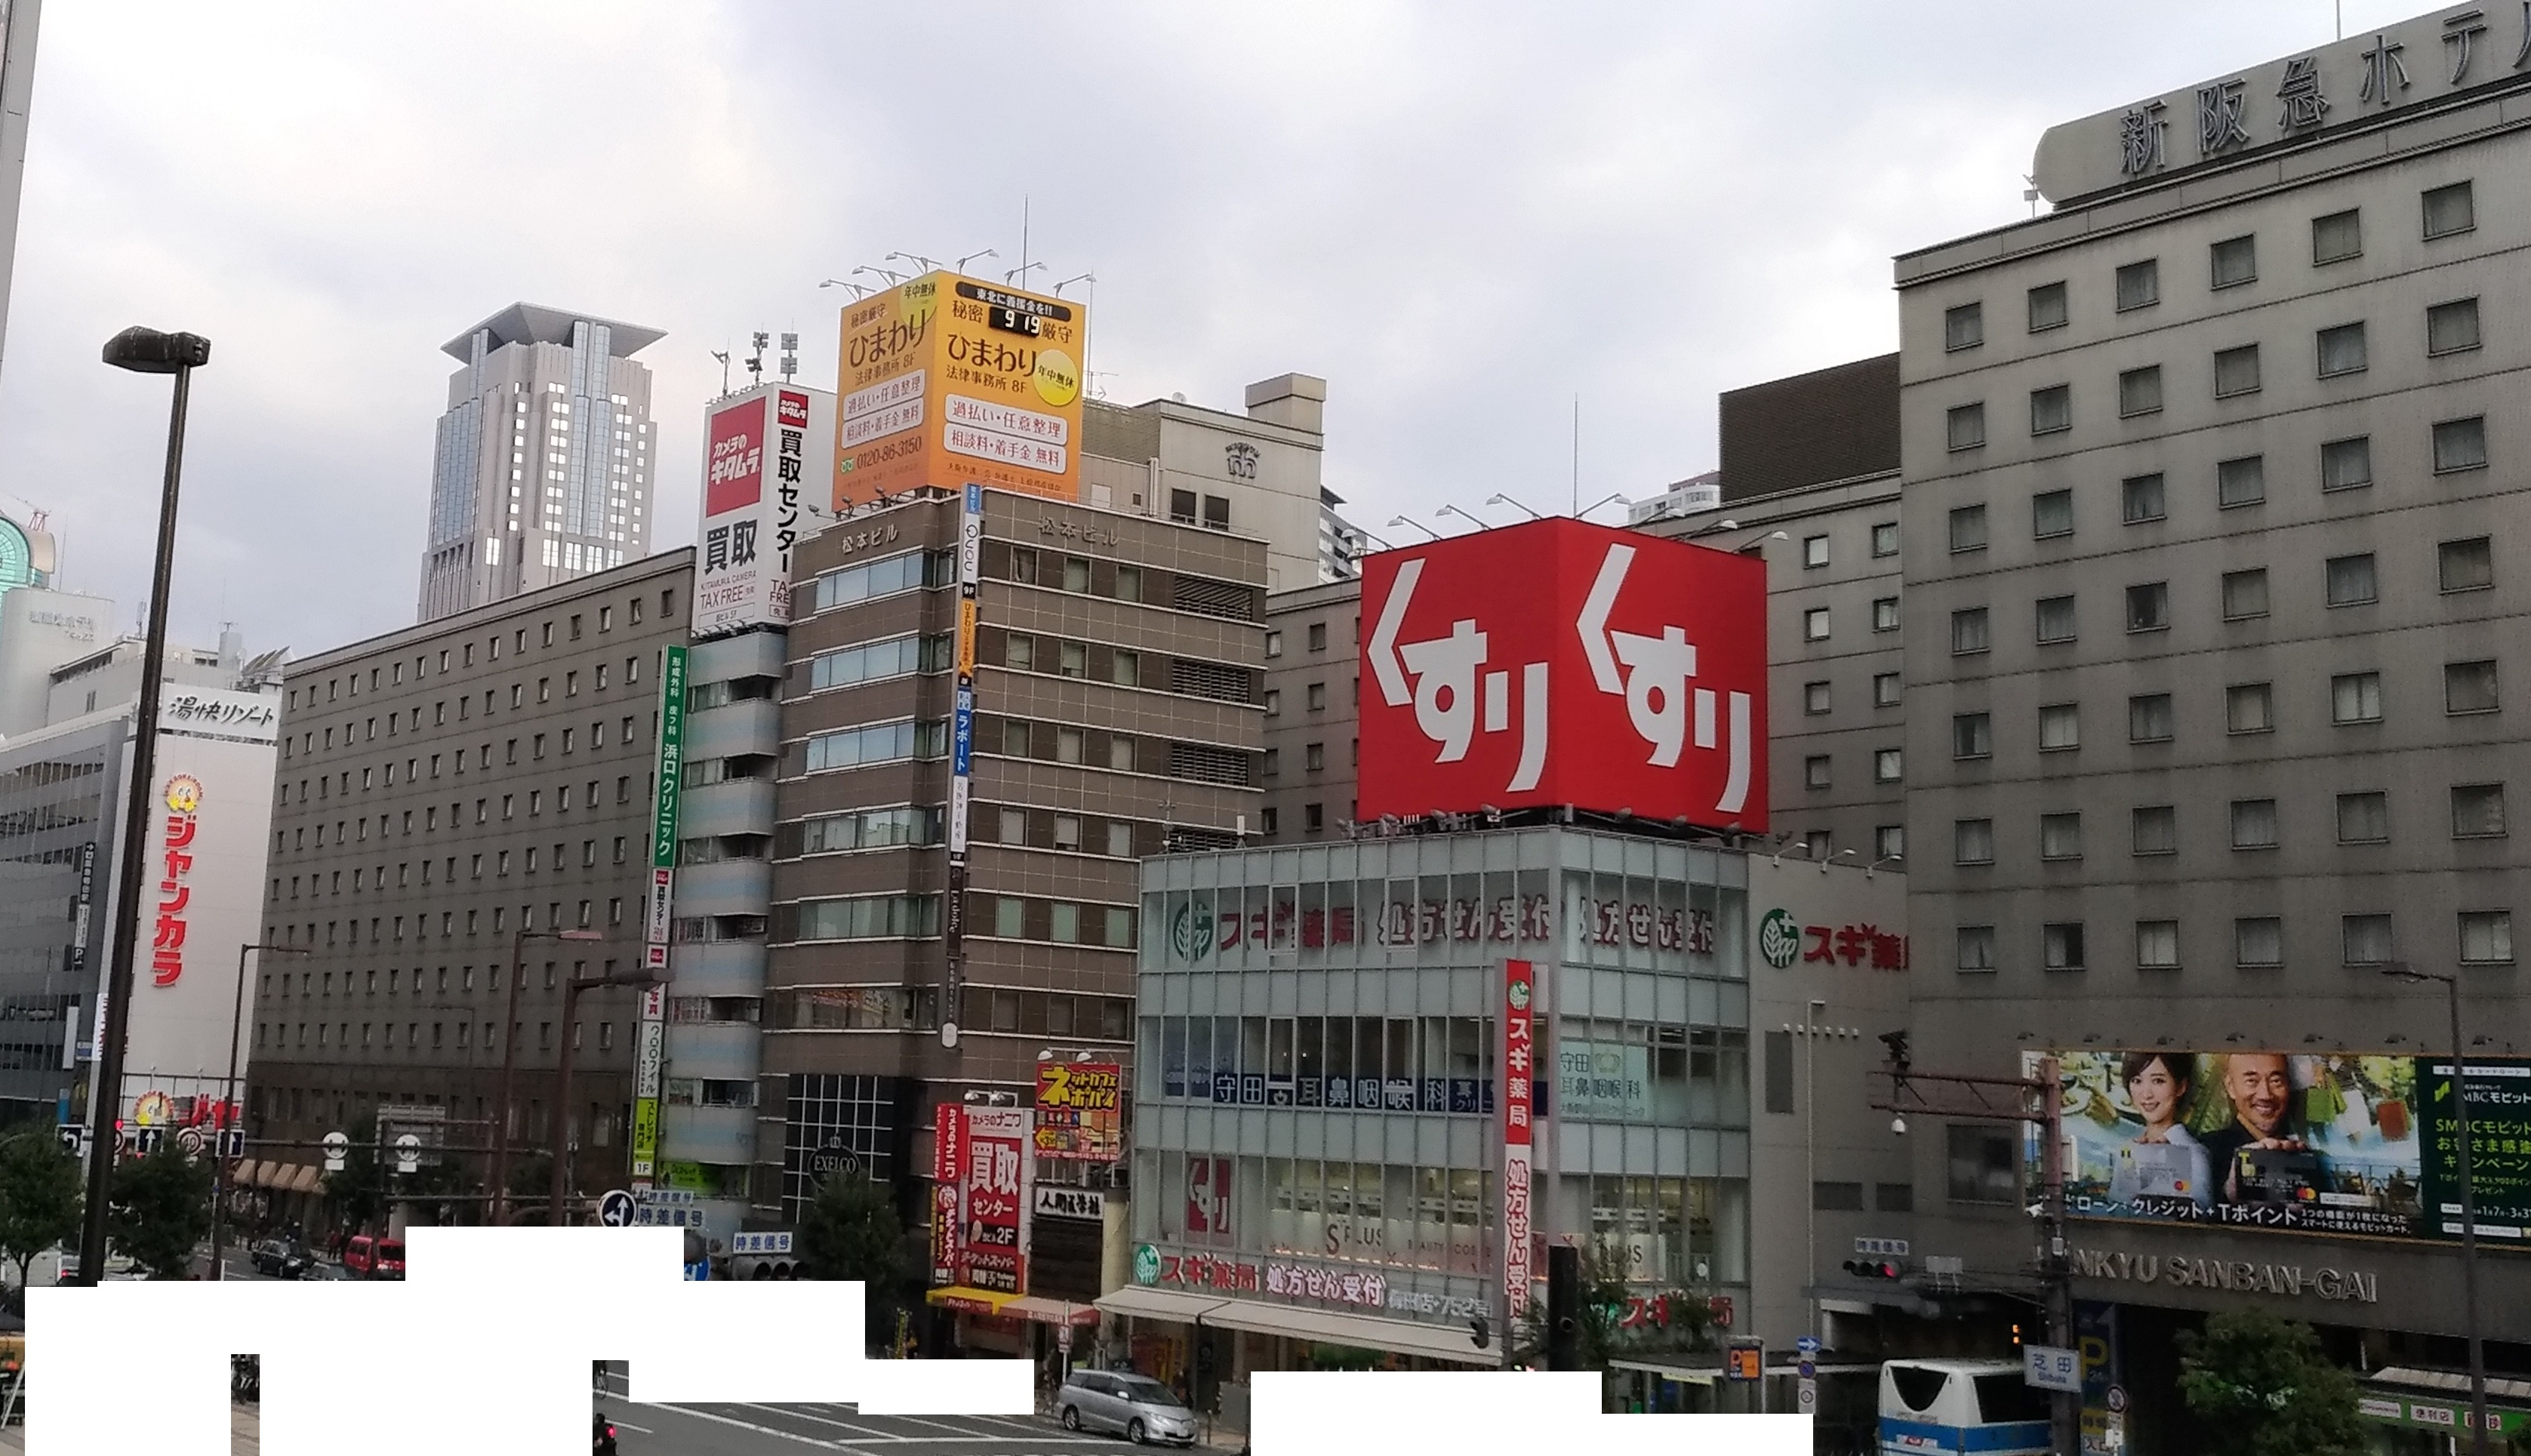 osaka_yodobashi_umeda_223_2.jpg